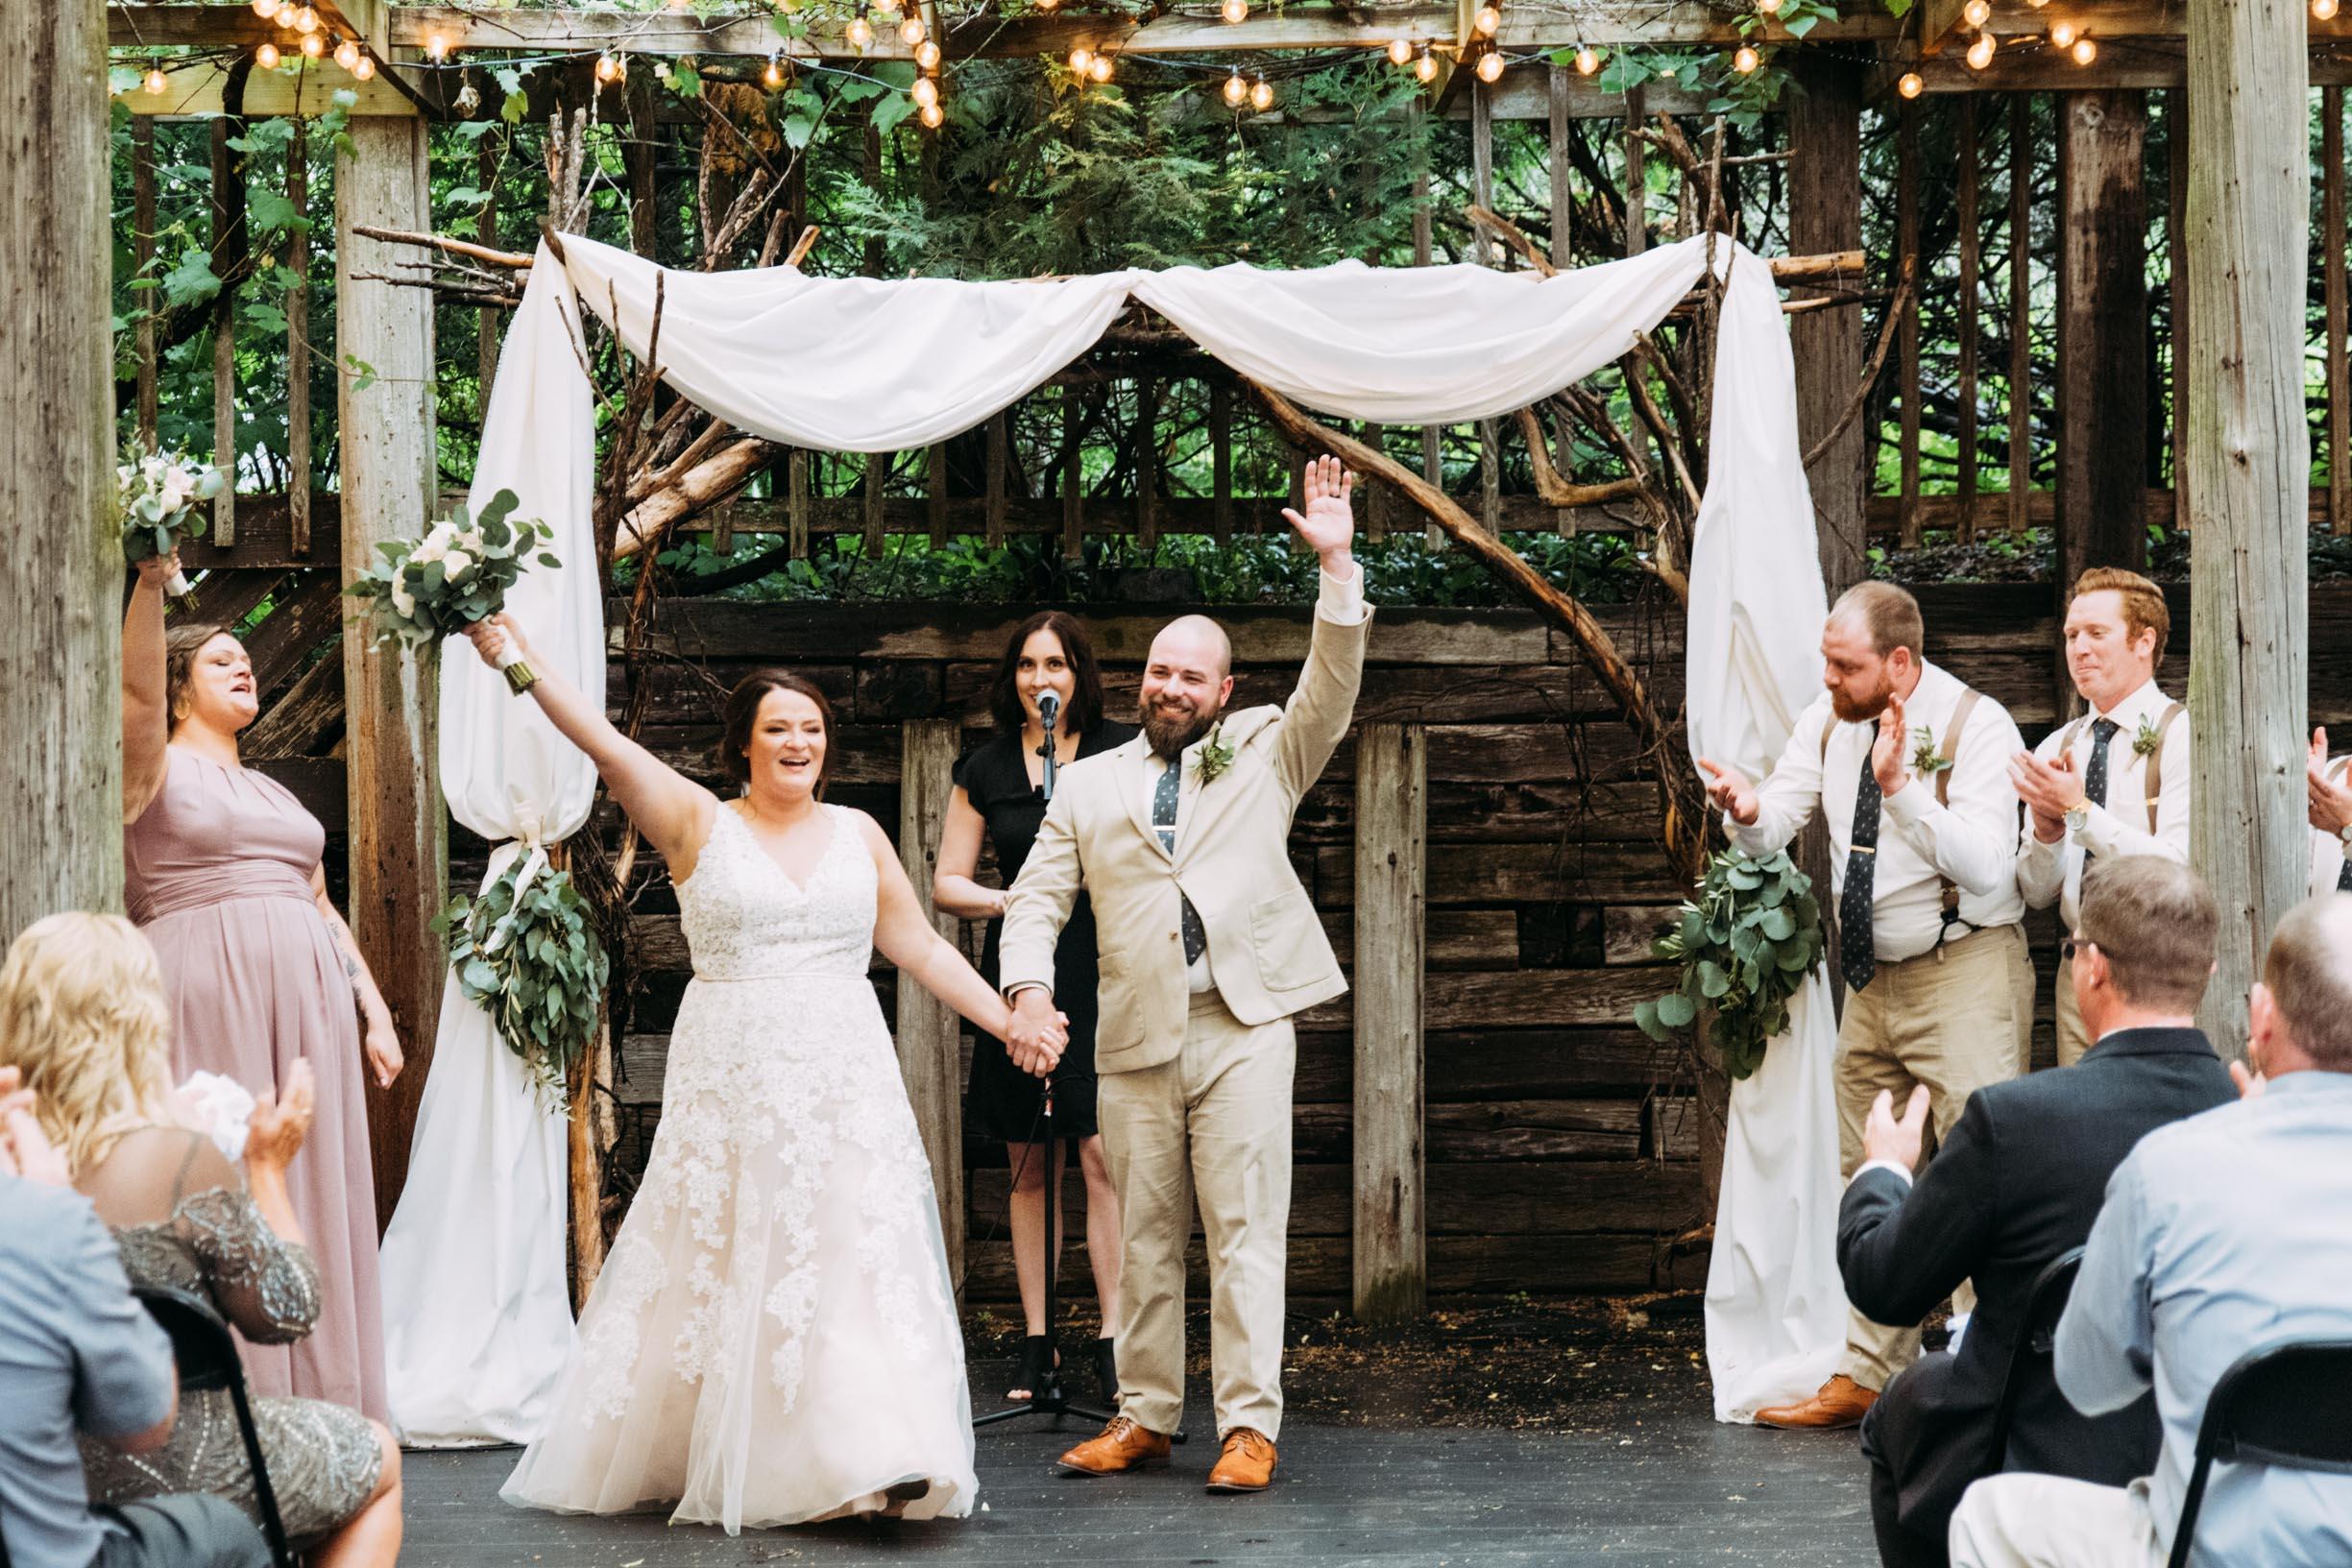 50-Jess_Jeremy_Minnesota_Wedding_Ceremony.jpg